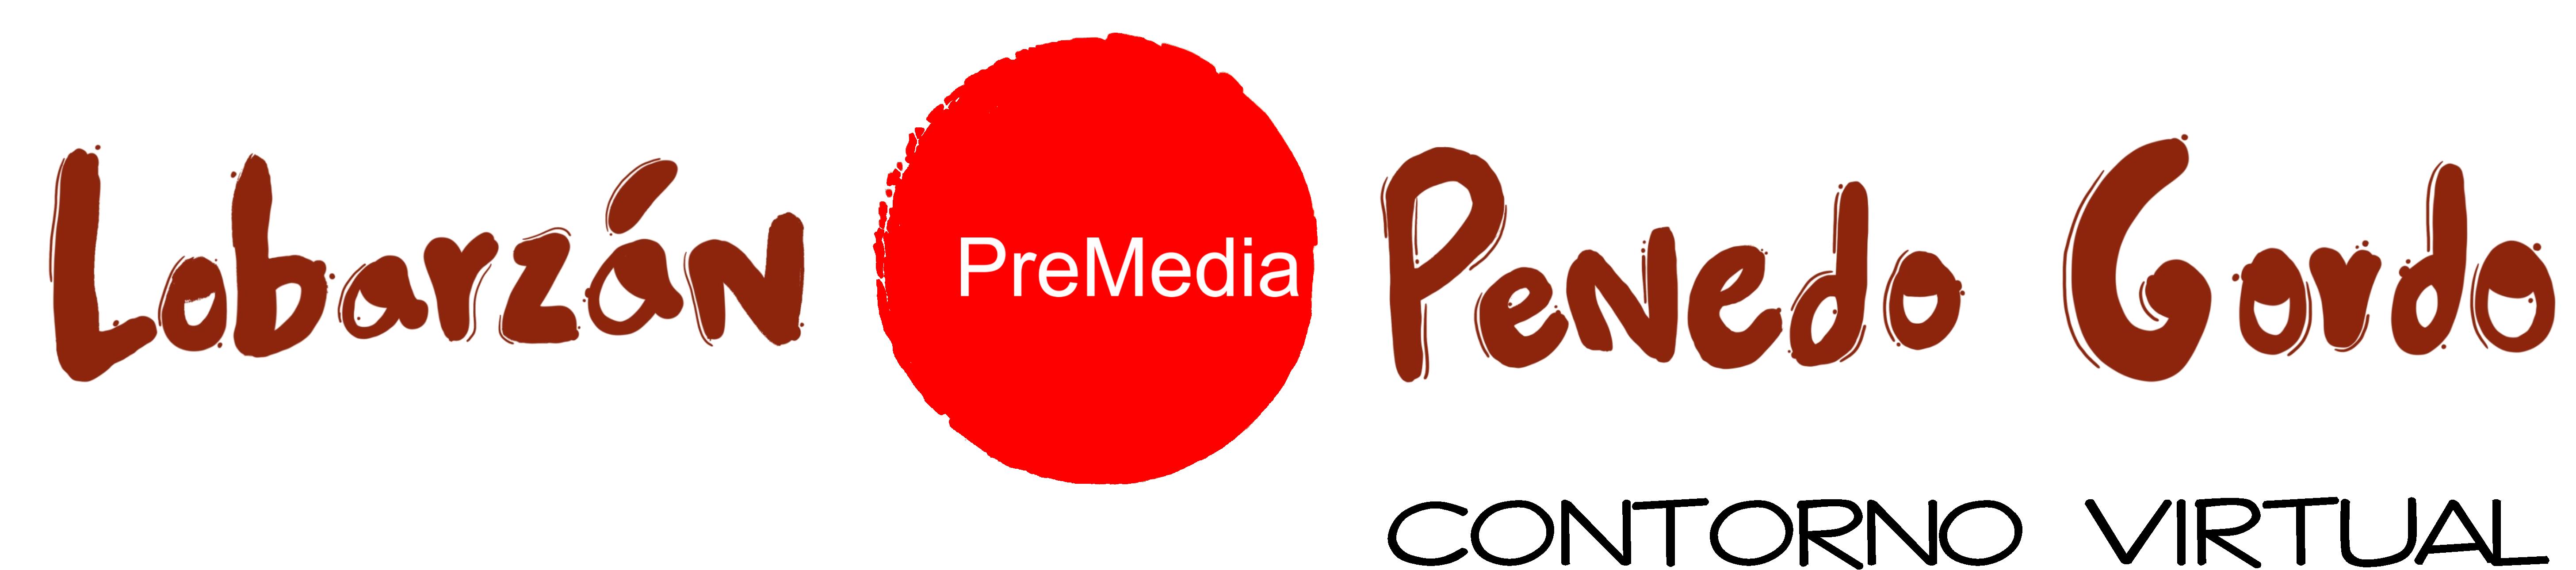 PreMedia